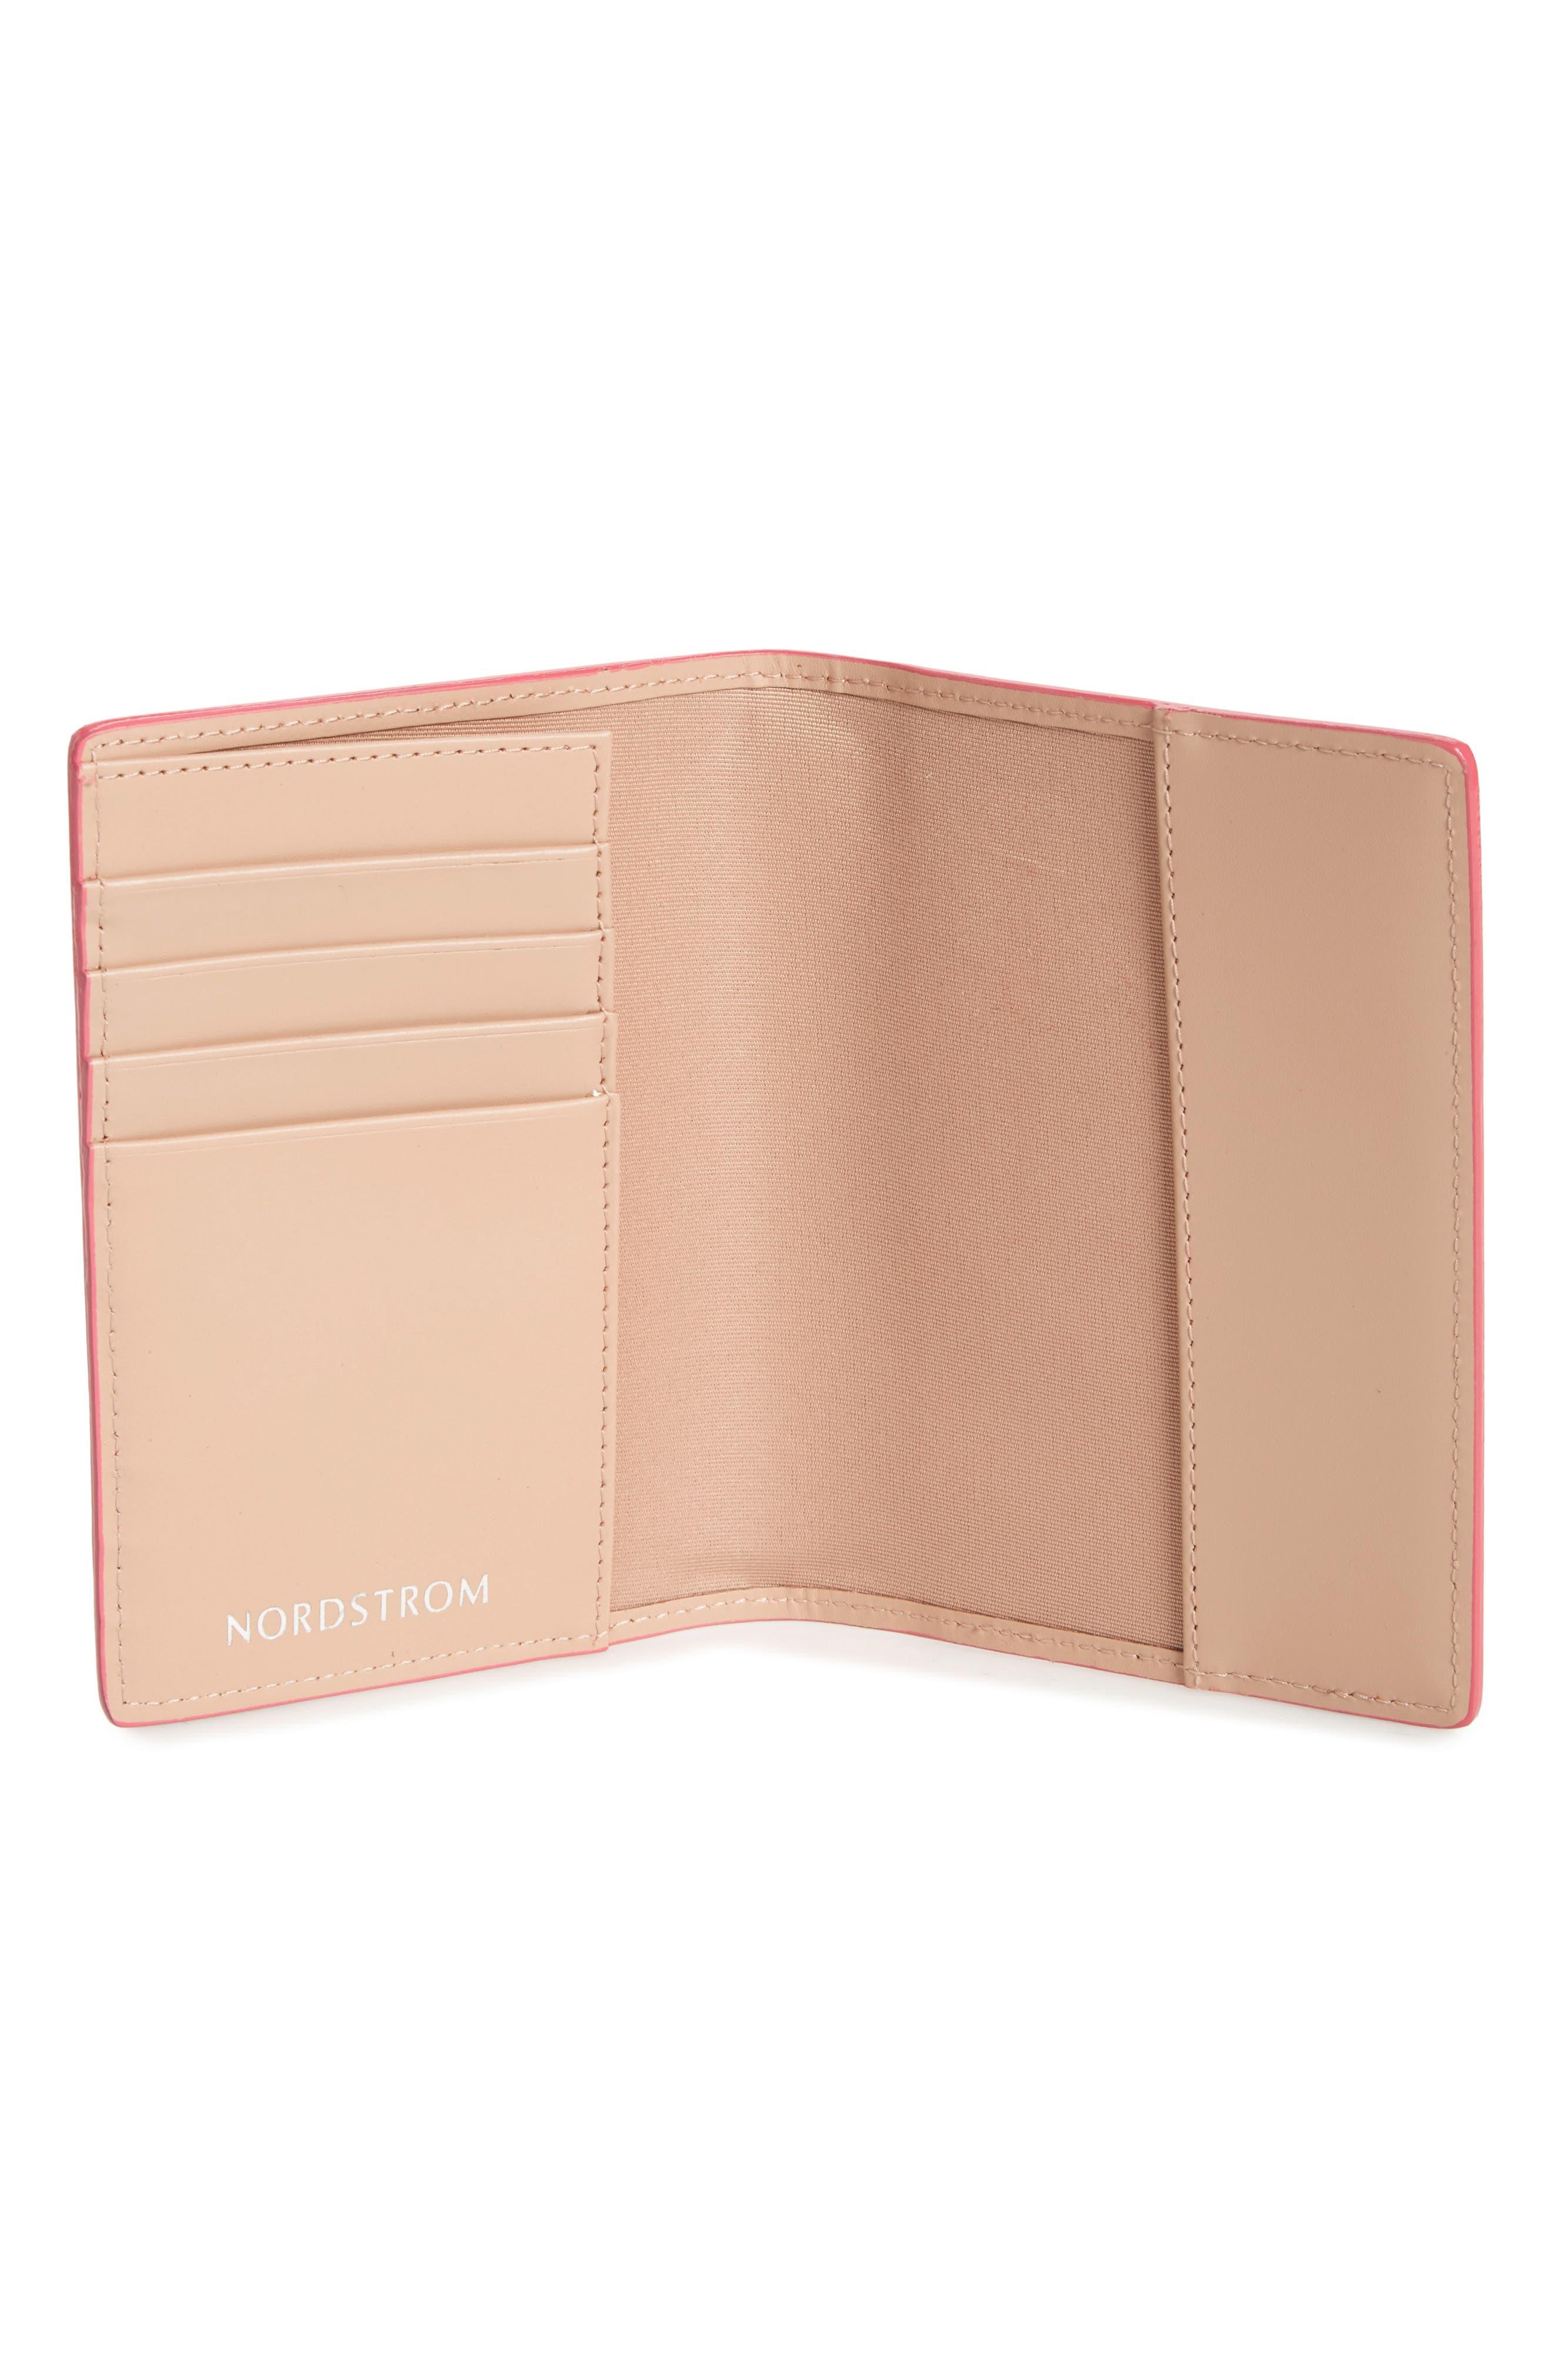 Leather Passport Case,                             Alternate thumbnail 16, color,